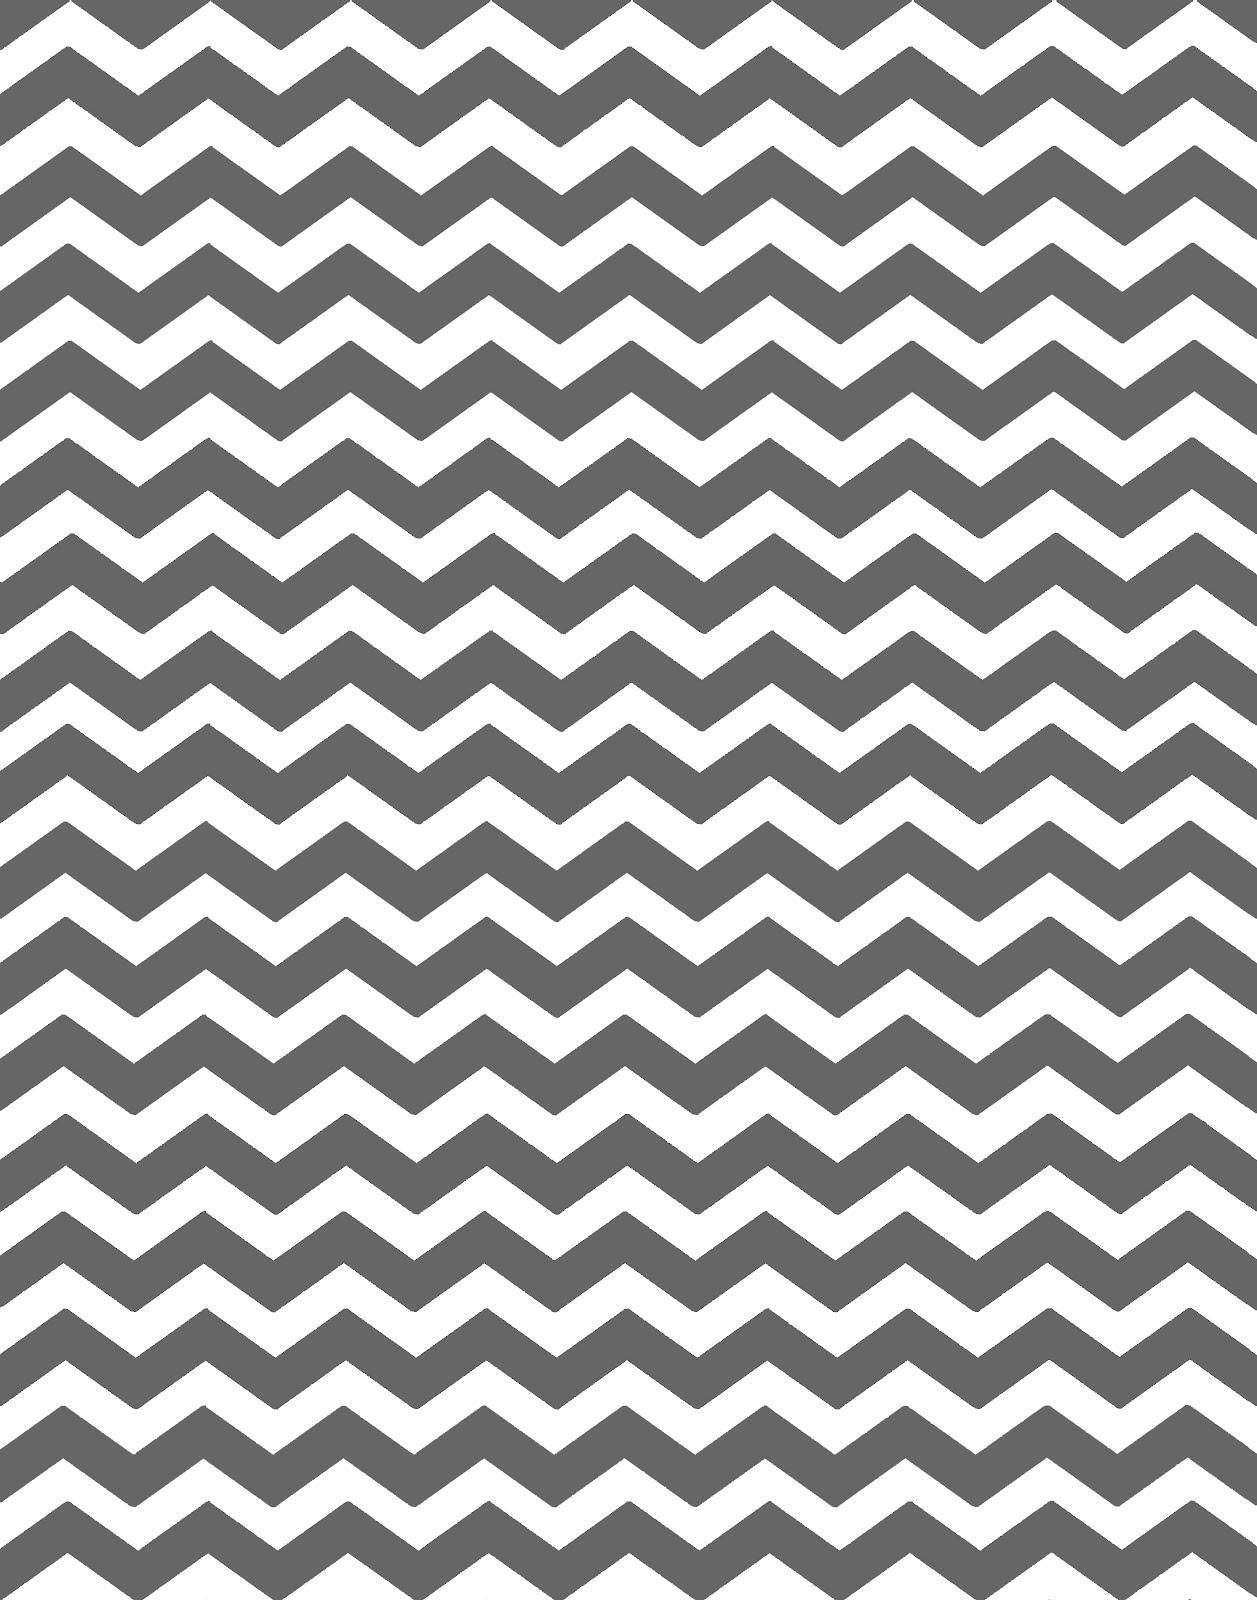 gray grey chevron background paper pattern jpg ultimate bridesmaid